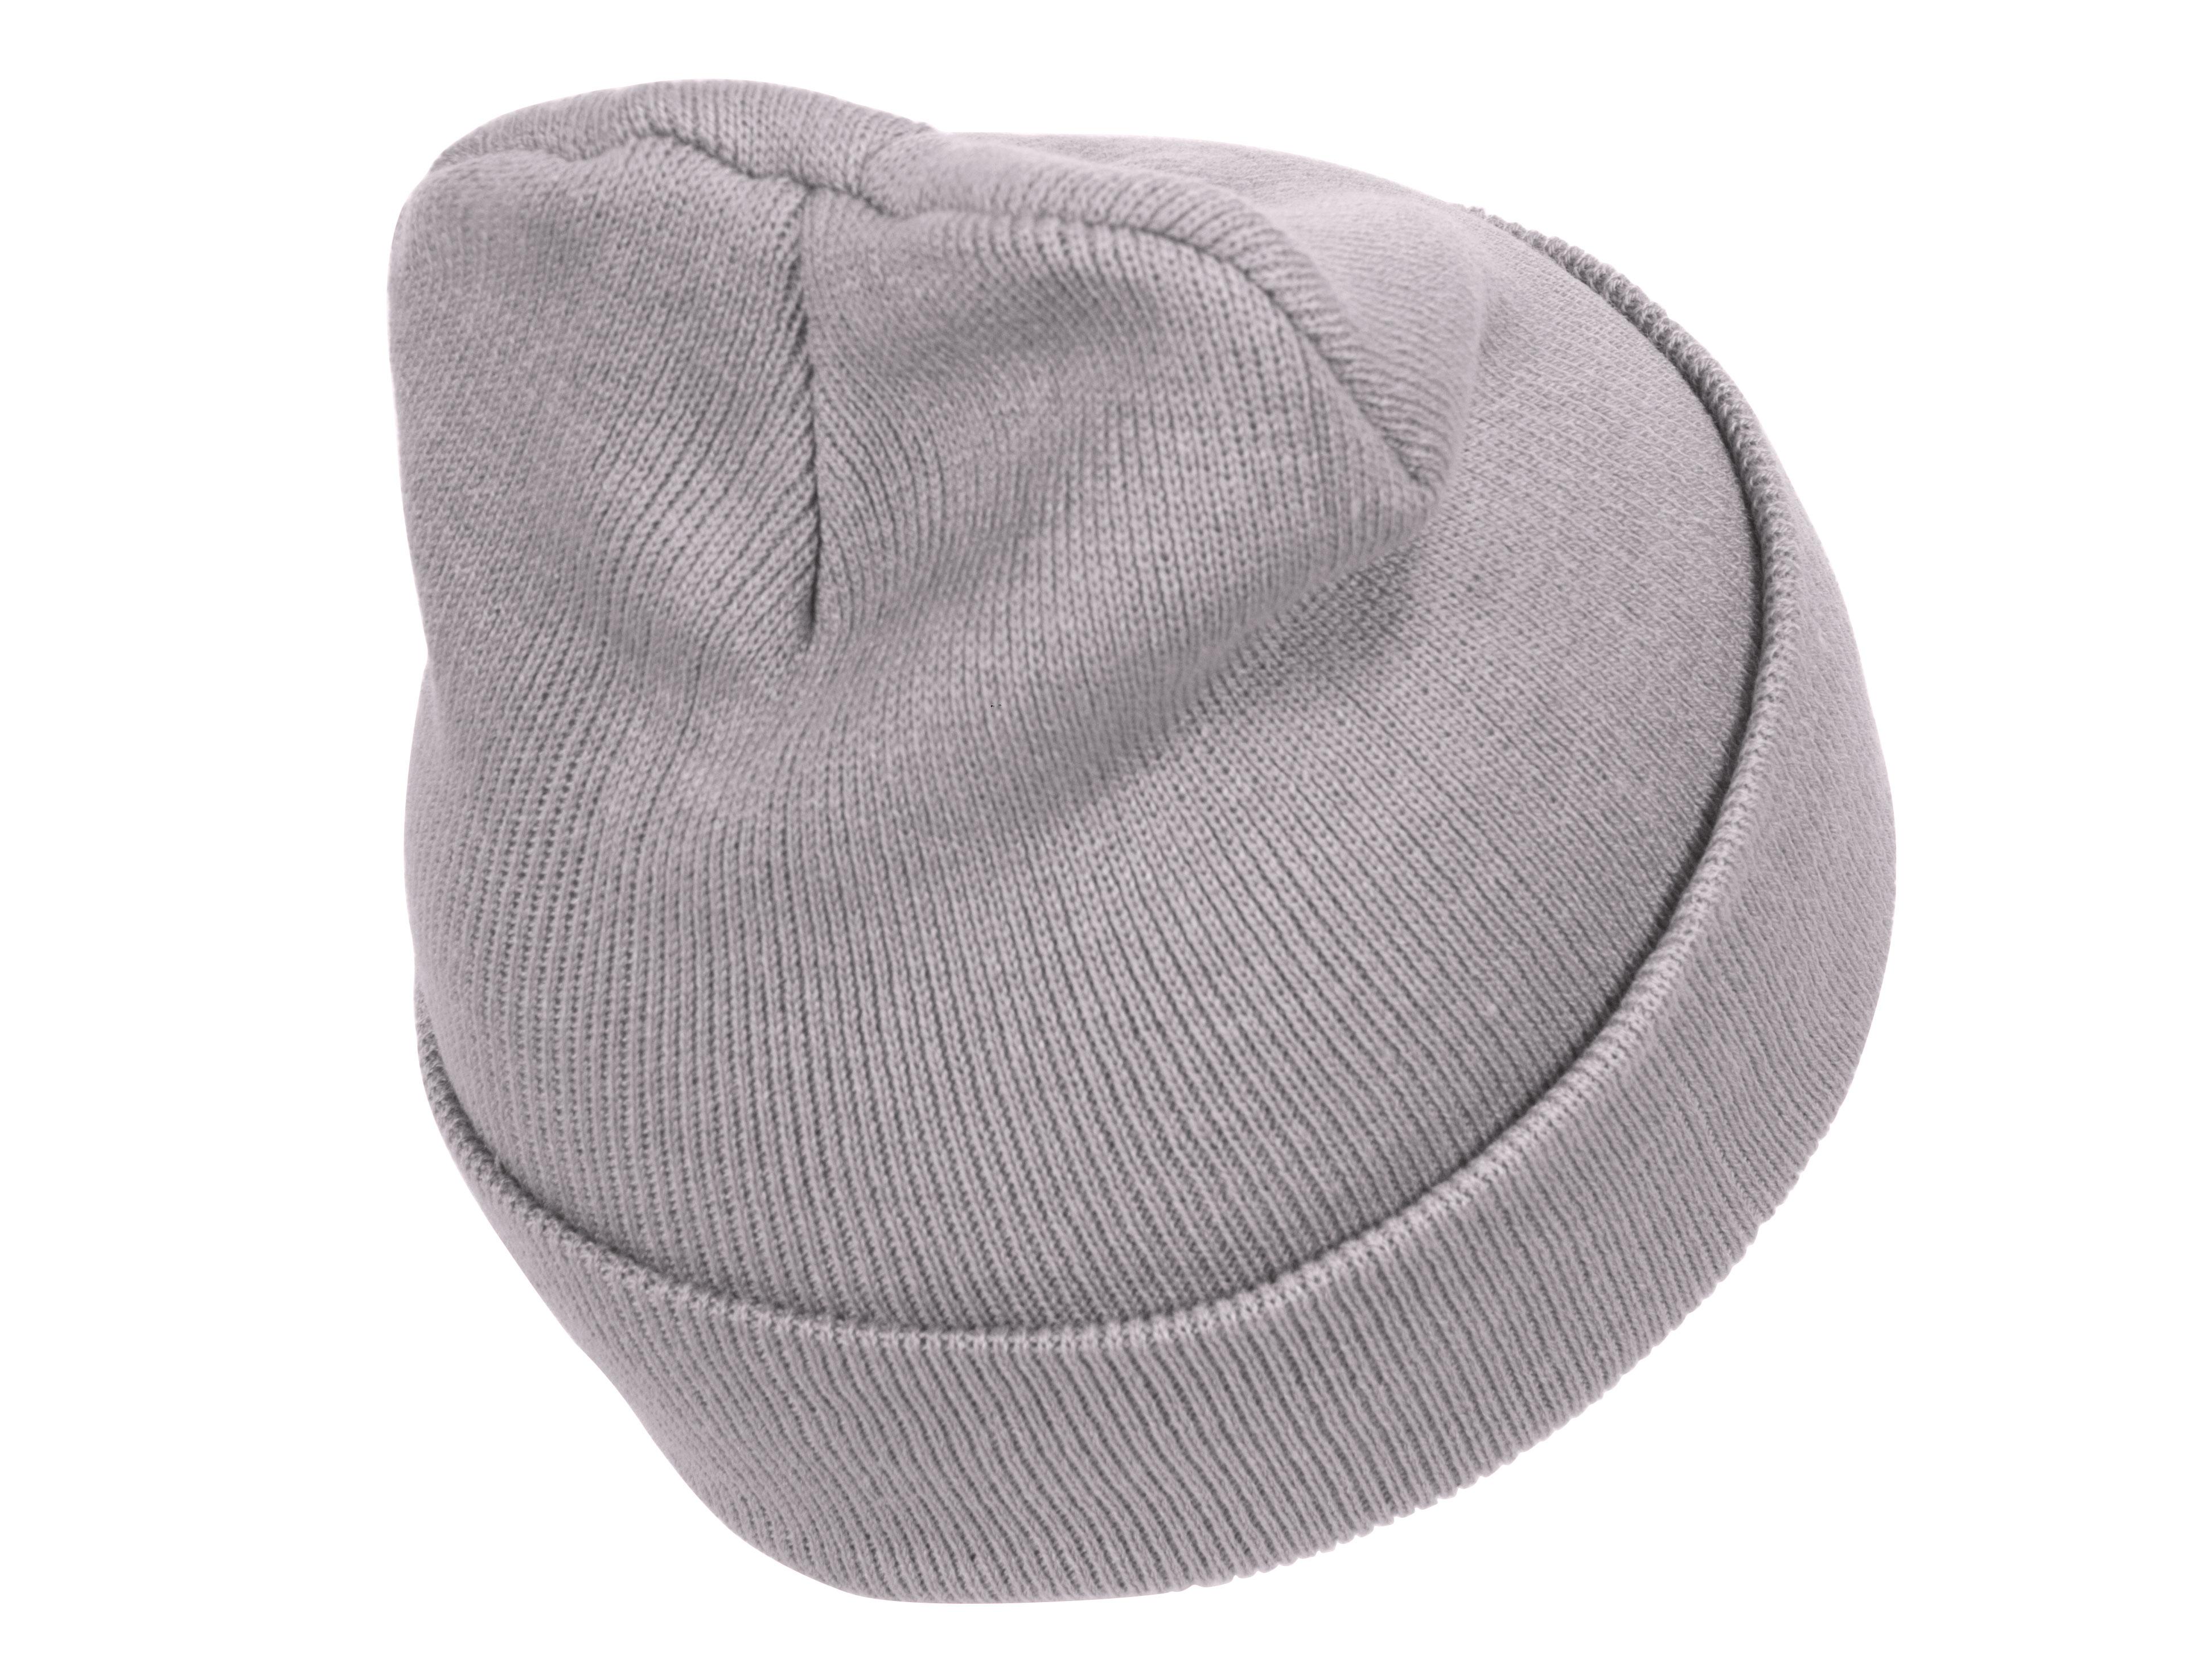 thumbnail 31 - Top Headwear Solid Winter Long Beanie - 12 Piece Wholesale